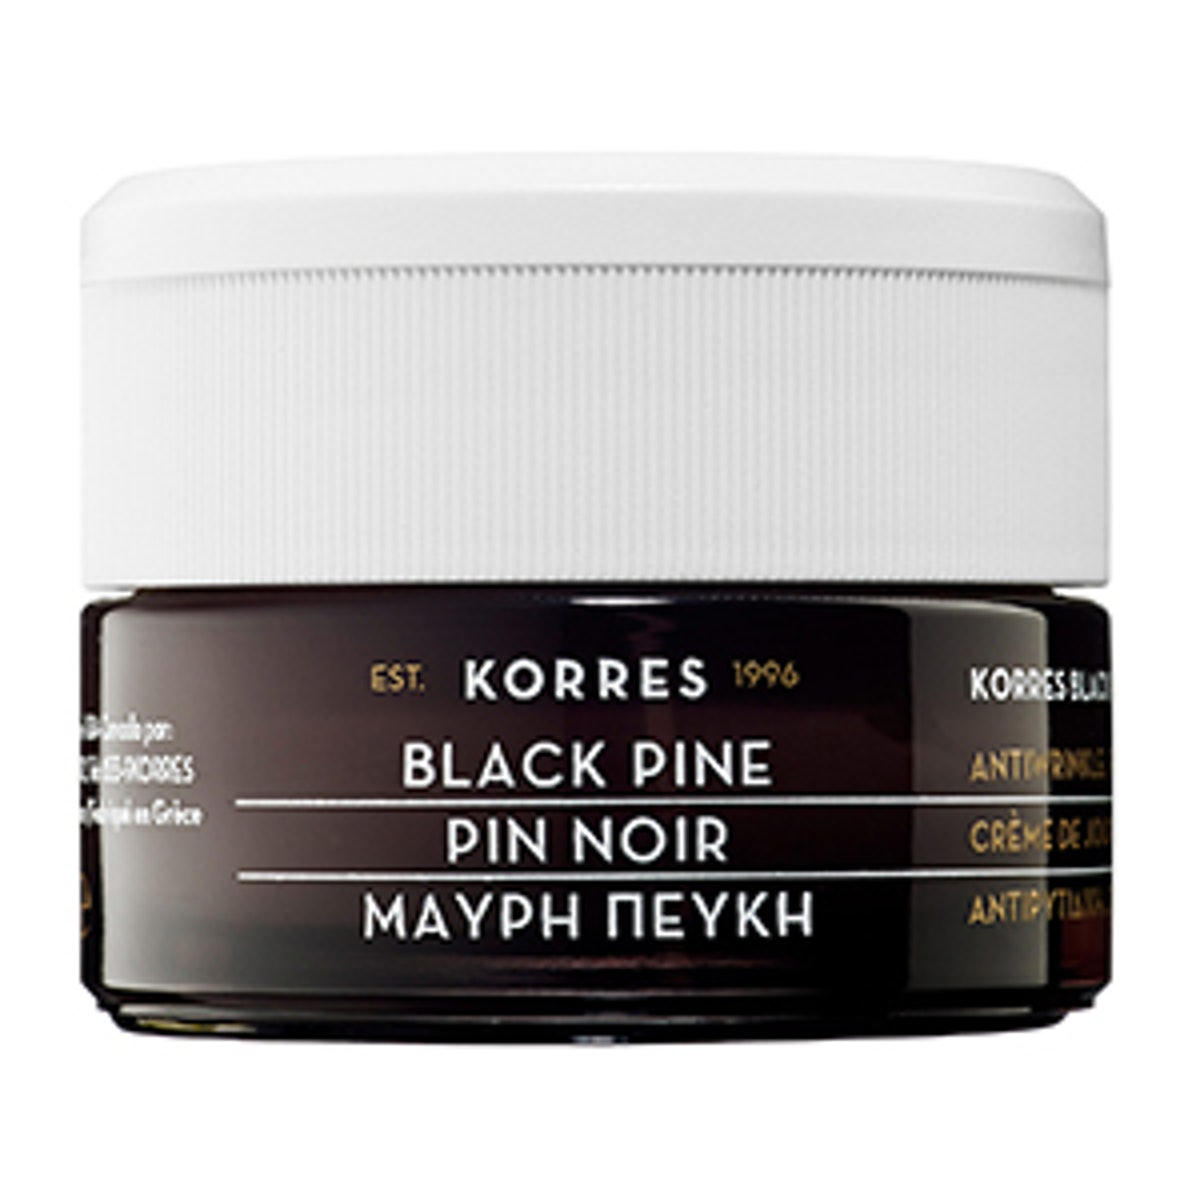 Black Pine Firming, Lifting & Antiwrinkle Night Cream